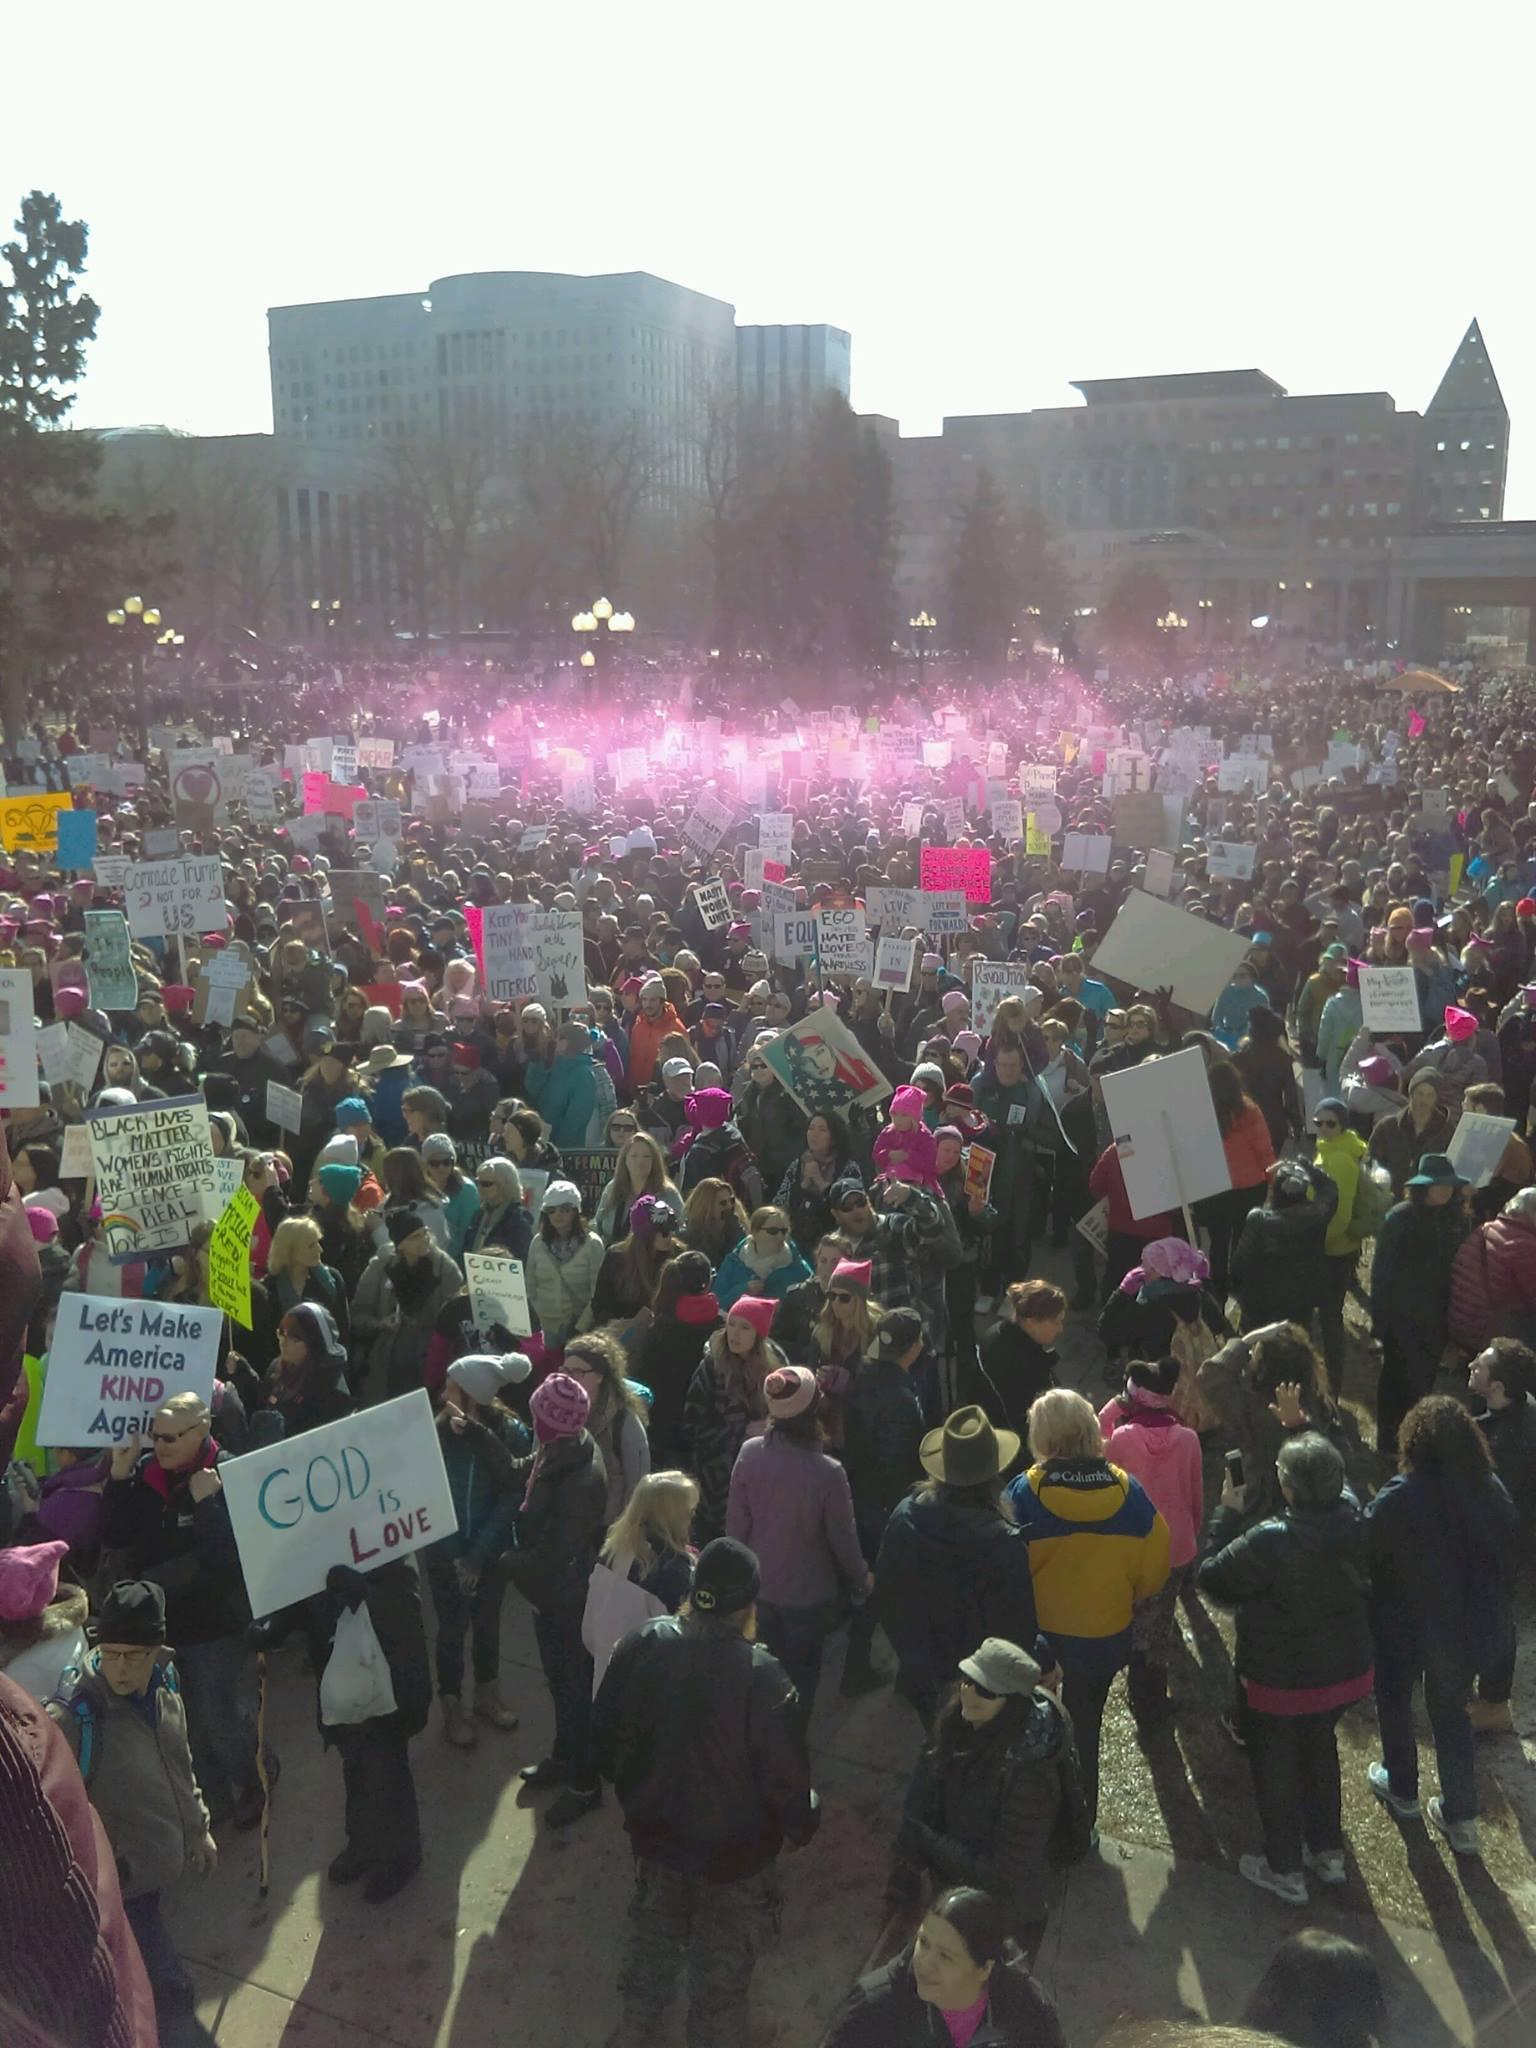 A collective pink aura captured at a recent women's march.